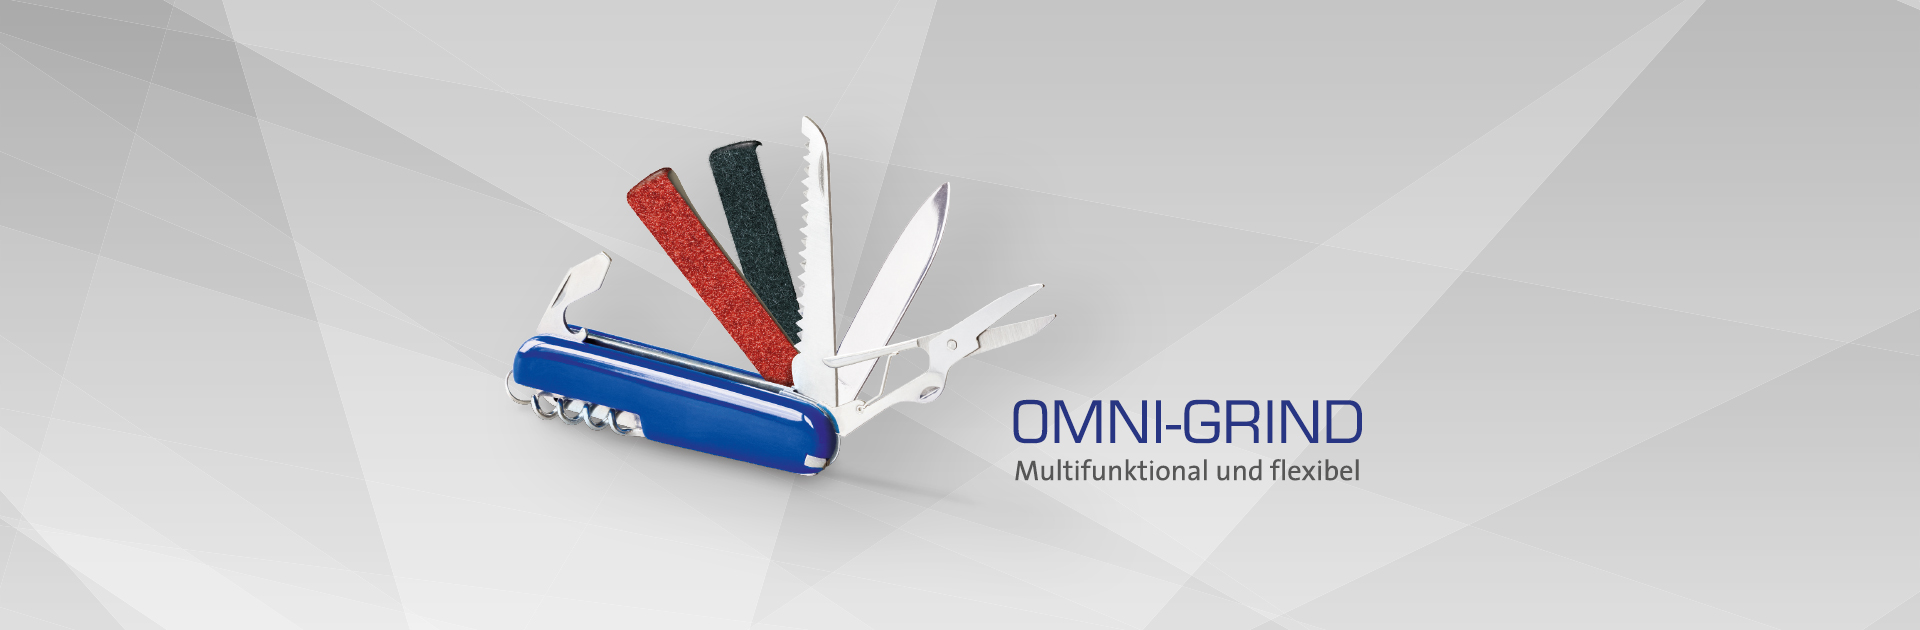 OMNI-GRIND - Multifunktional und flexibel